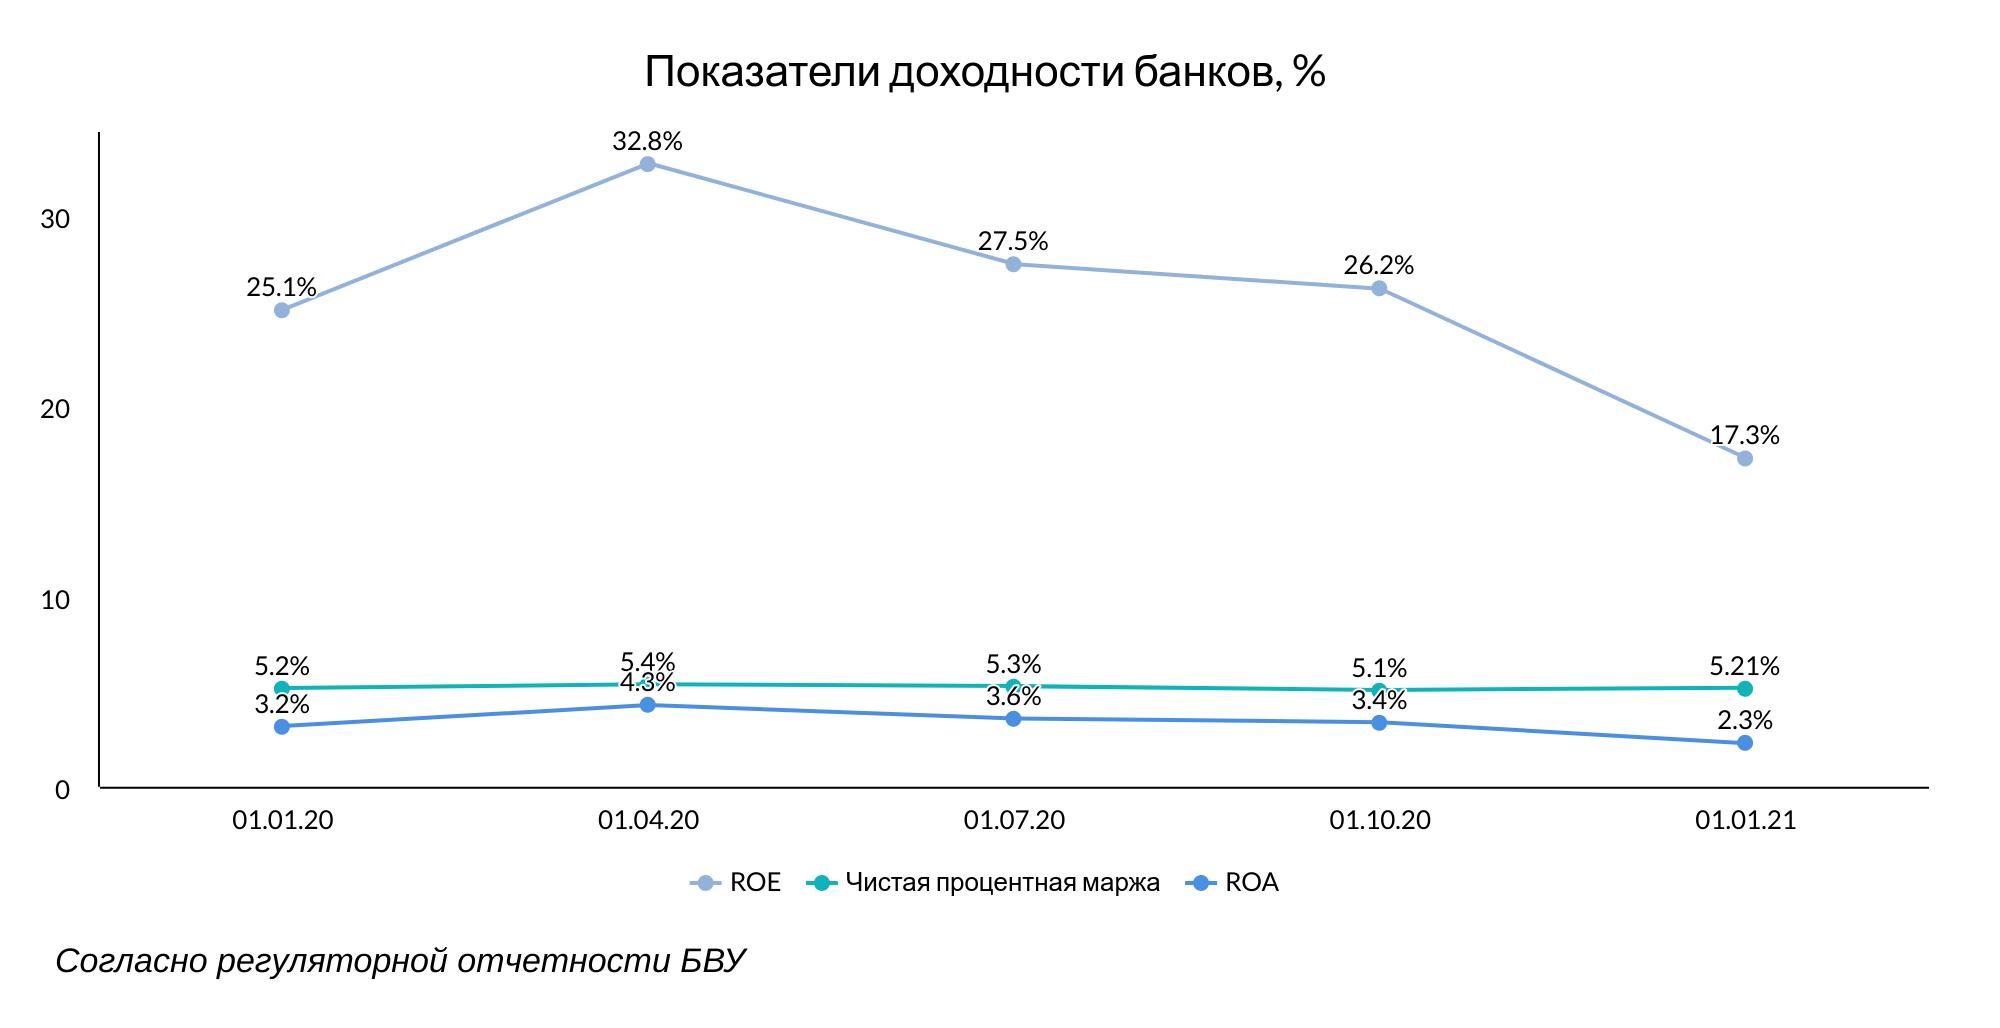 Банки Казахстана продолжают наращивать запасы ликвидности 595670 - Kapital.kz